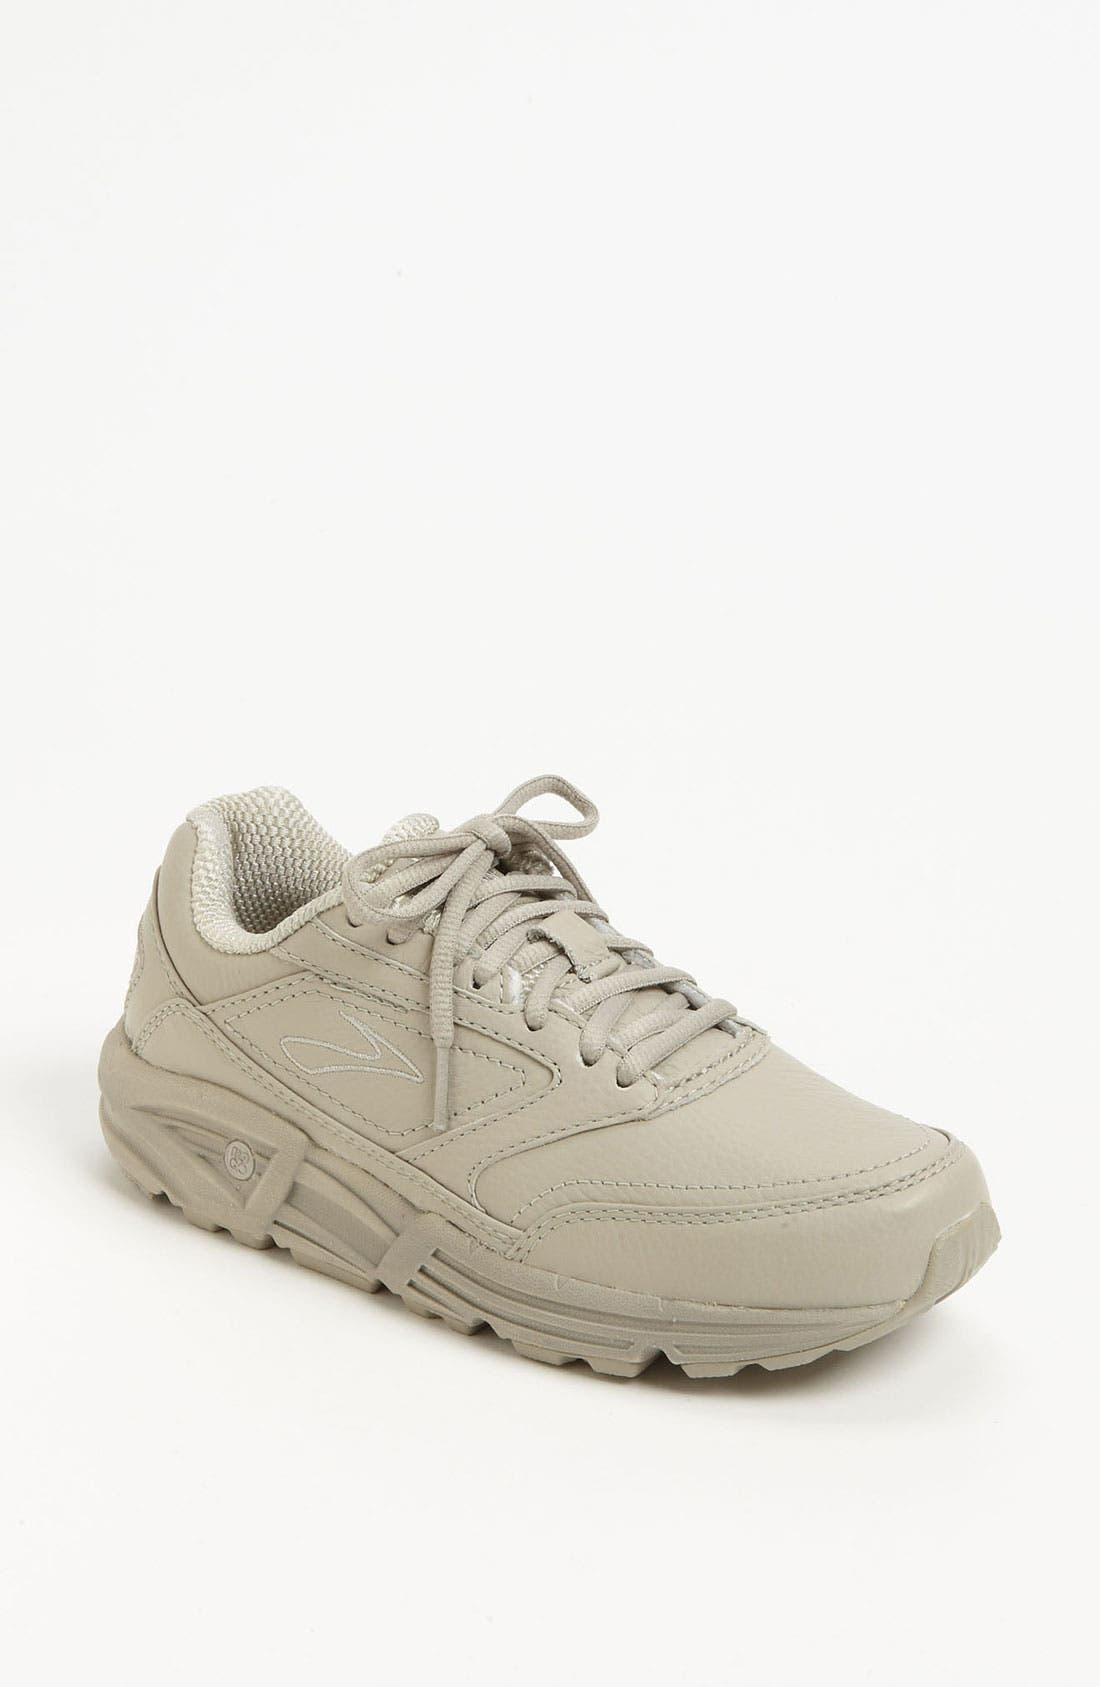 Women's Extra-Extra Wide (2XW, 2E, EEEE) Shoes